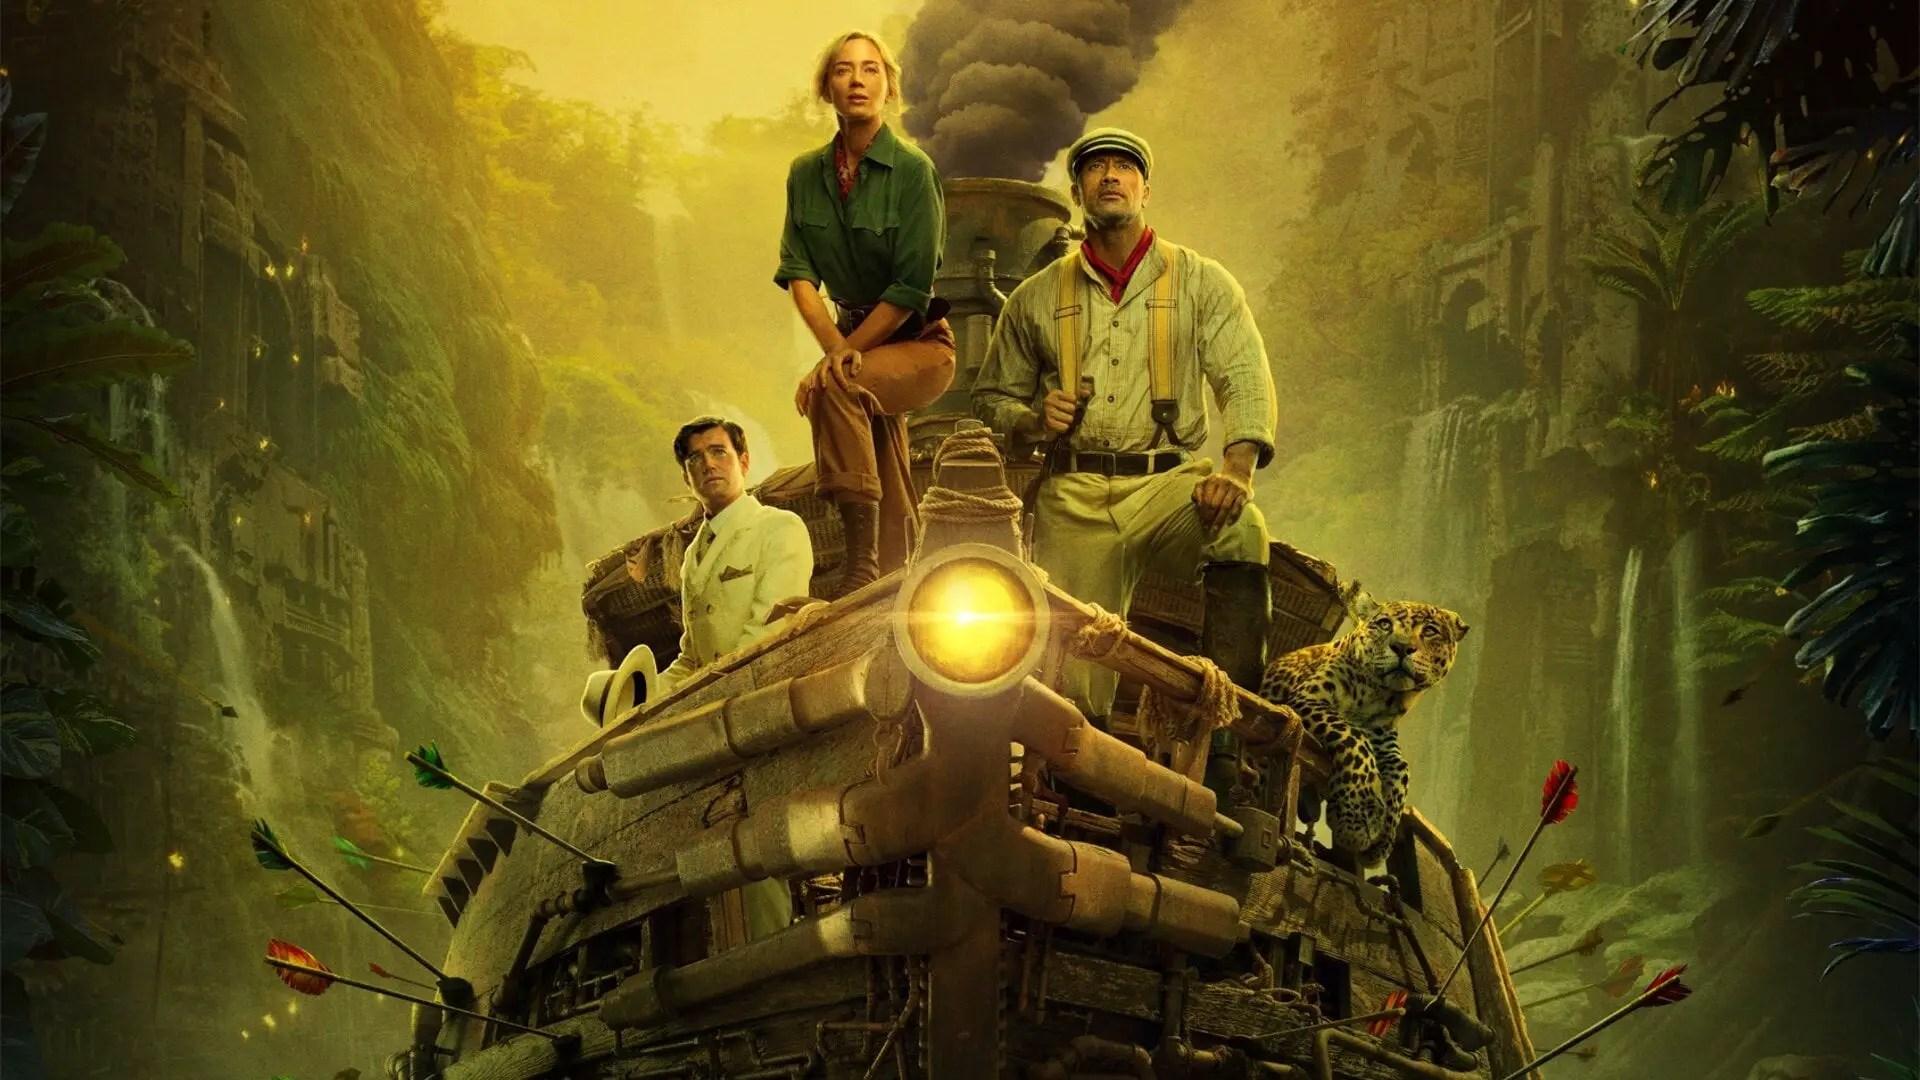 'Jungle Cruise' review: A fun adventure with delightful romance